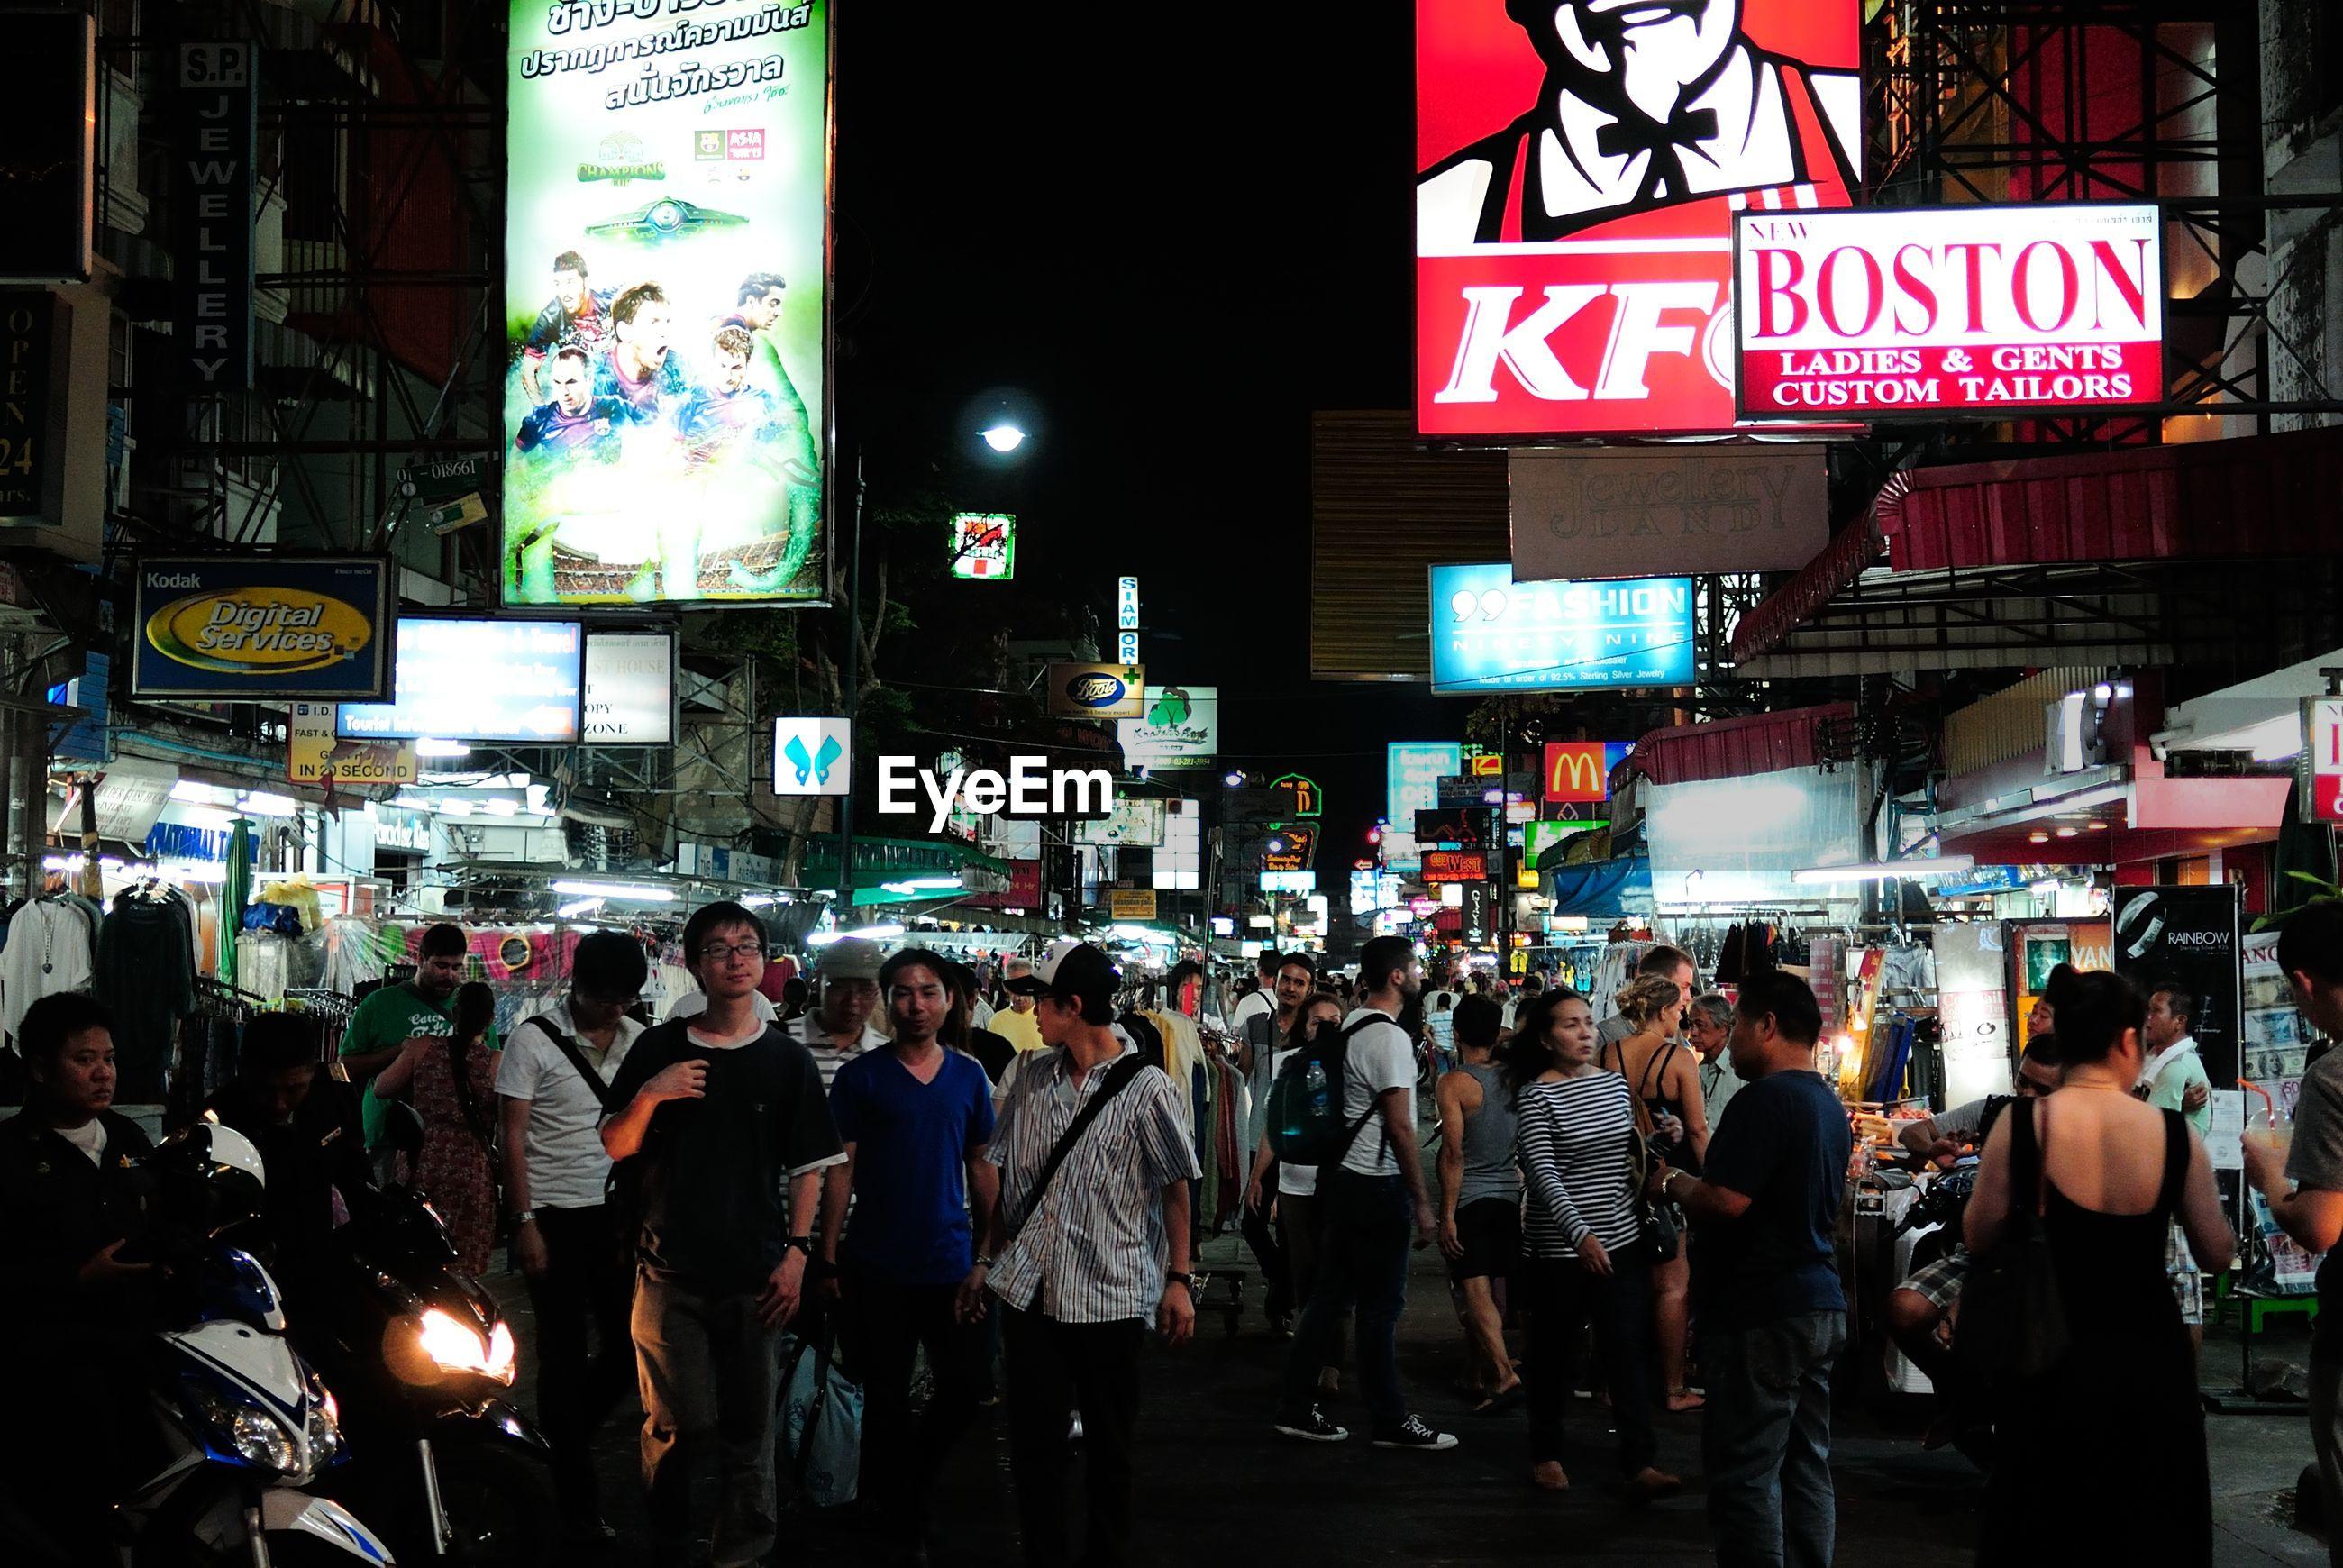 Crowd on street market at night